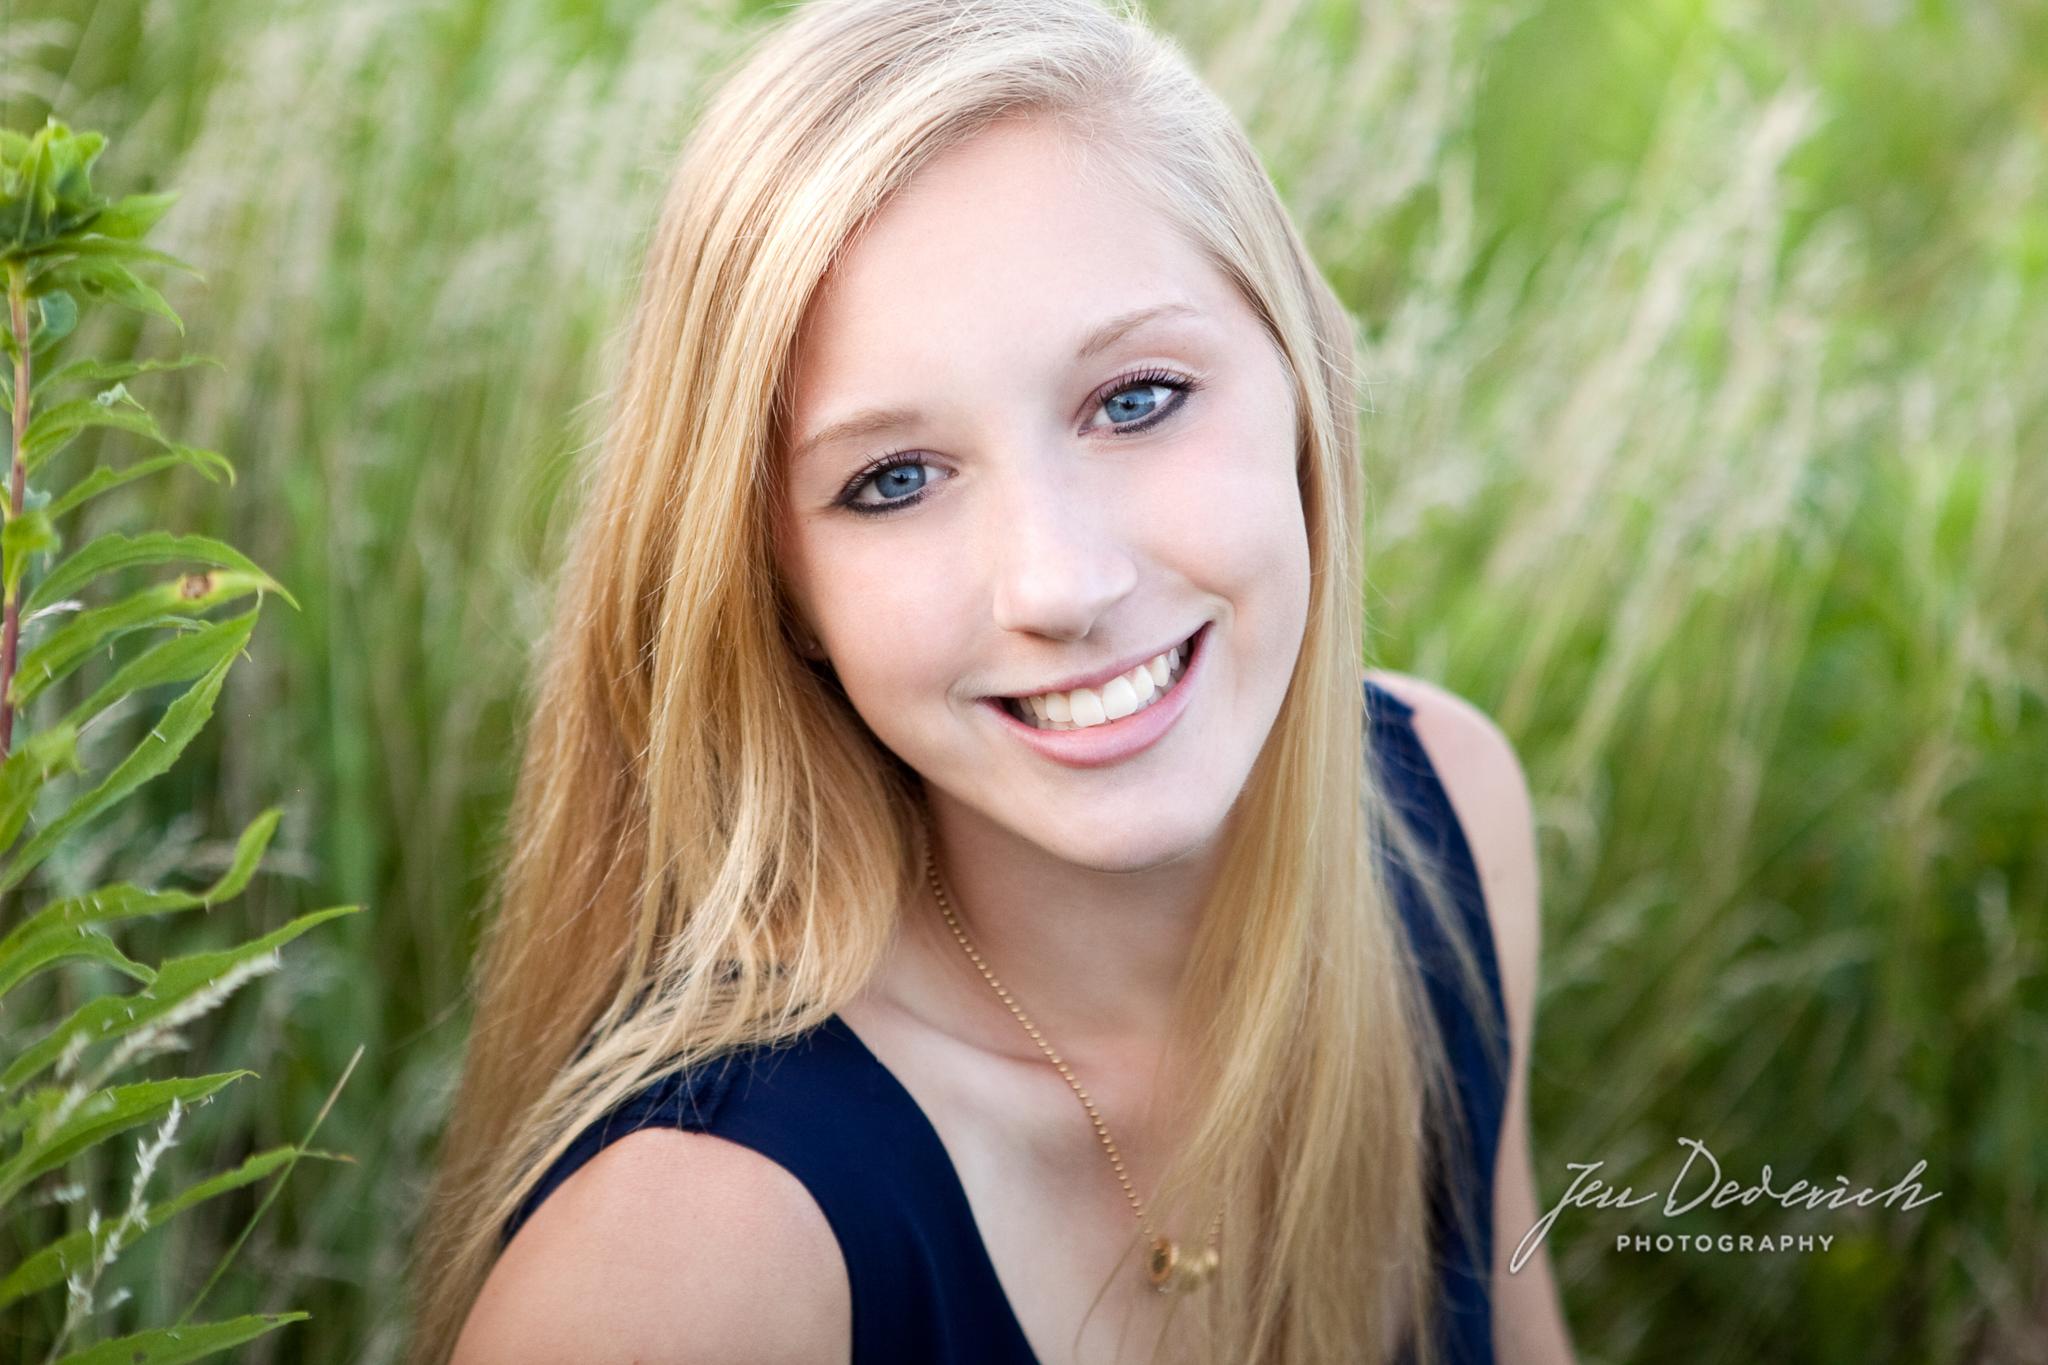 Senior_Madison WI_Jen Dederich Photography_005.jpg